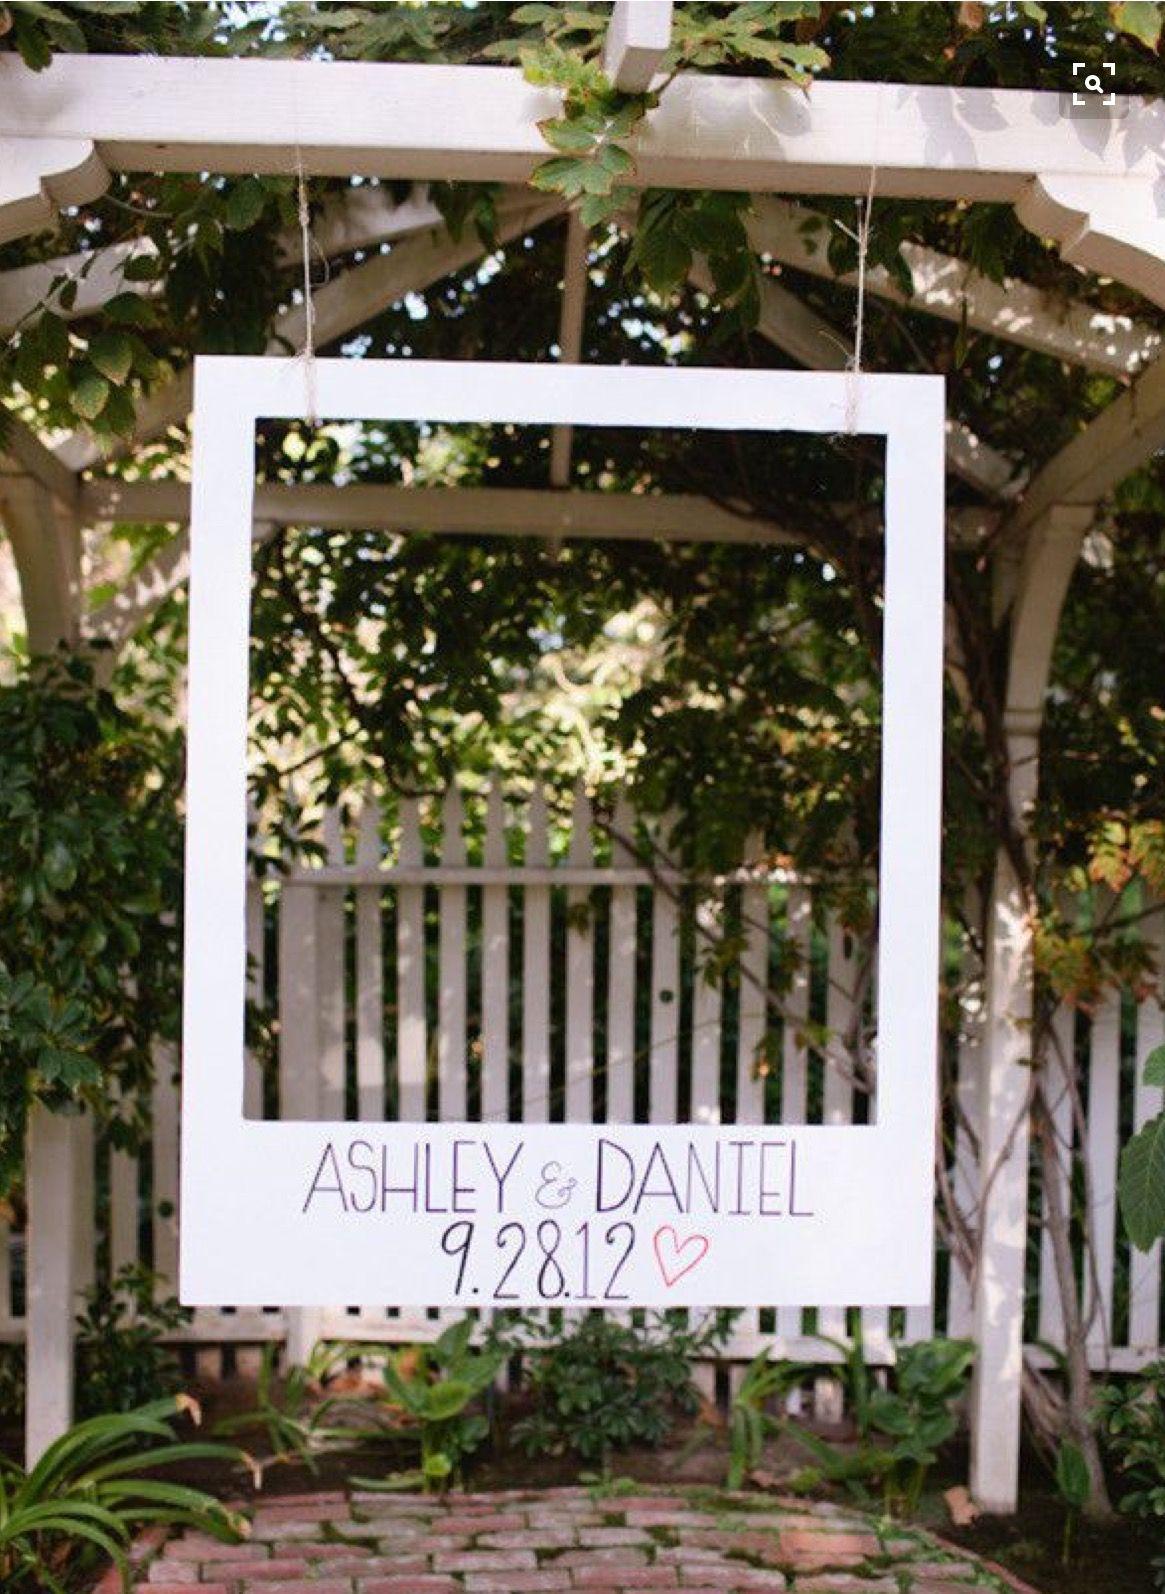 wedding photo booth props printable%0A Polaroid photo booth backdrop for rustic wedding ceremony ideas  rusticweddings weddingideas elegantweddinginvites